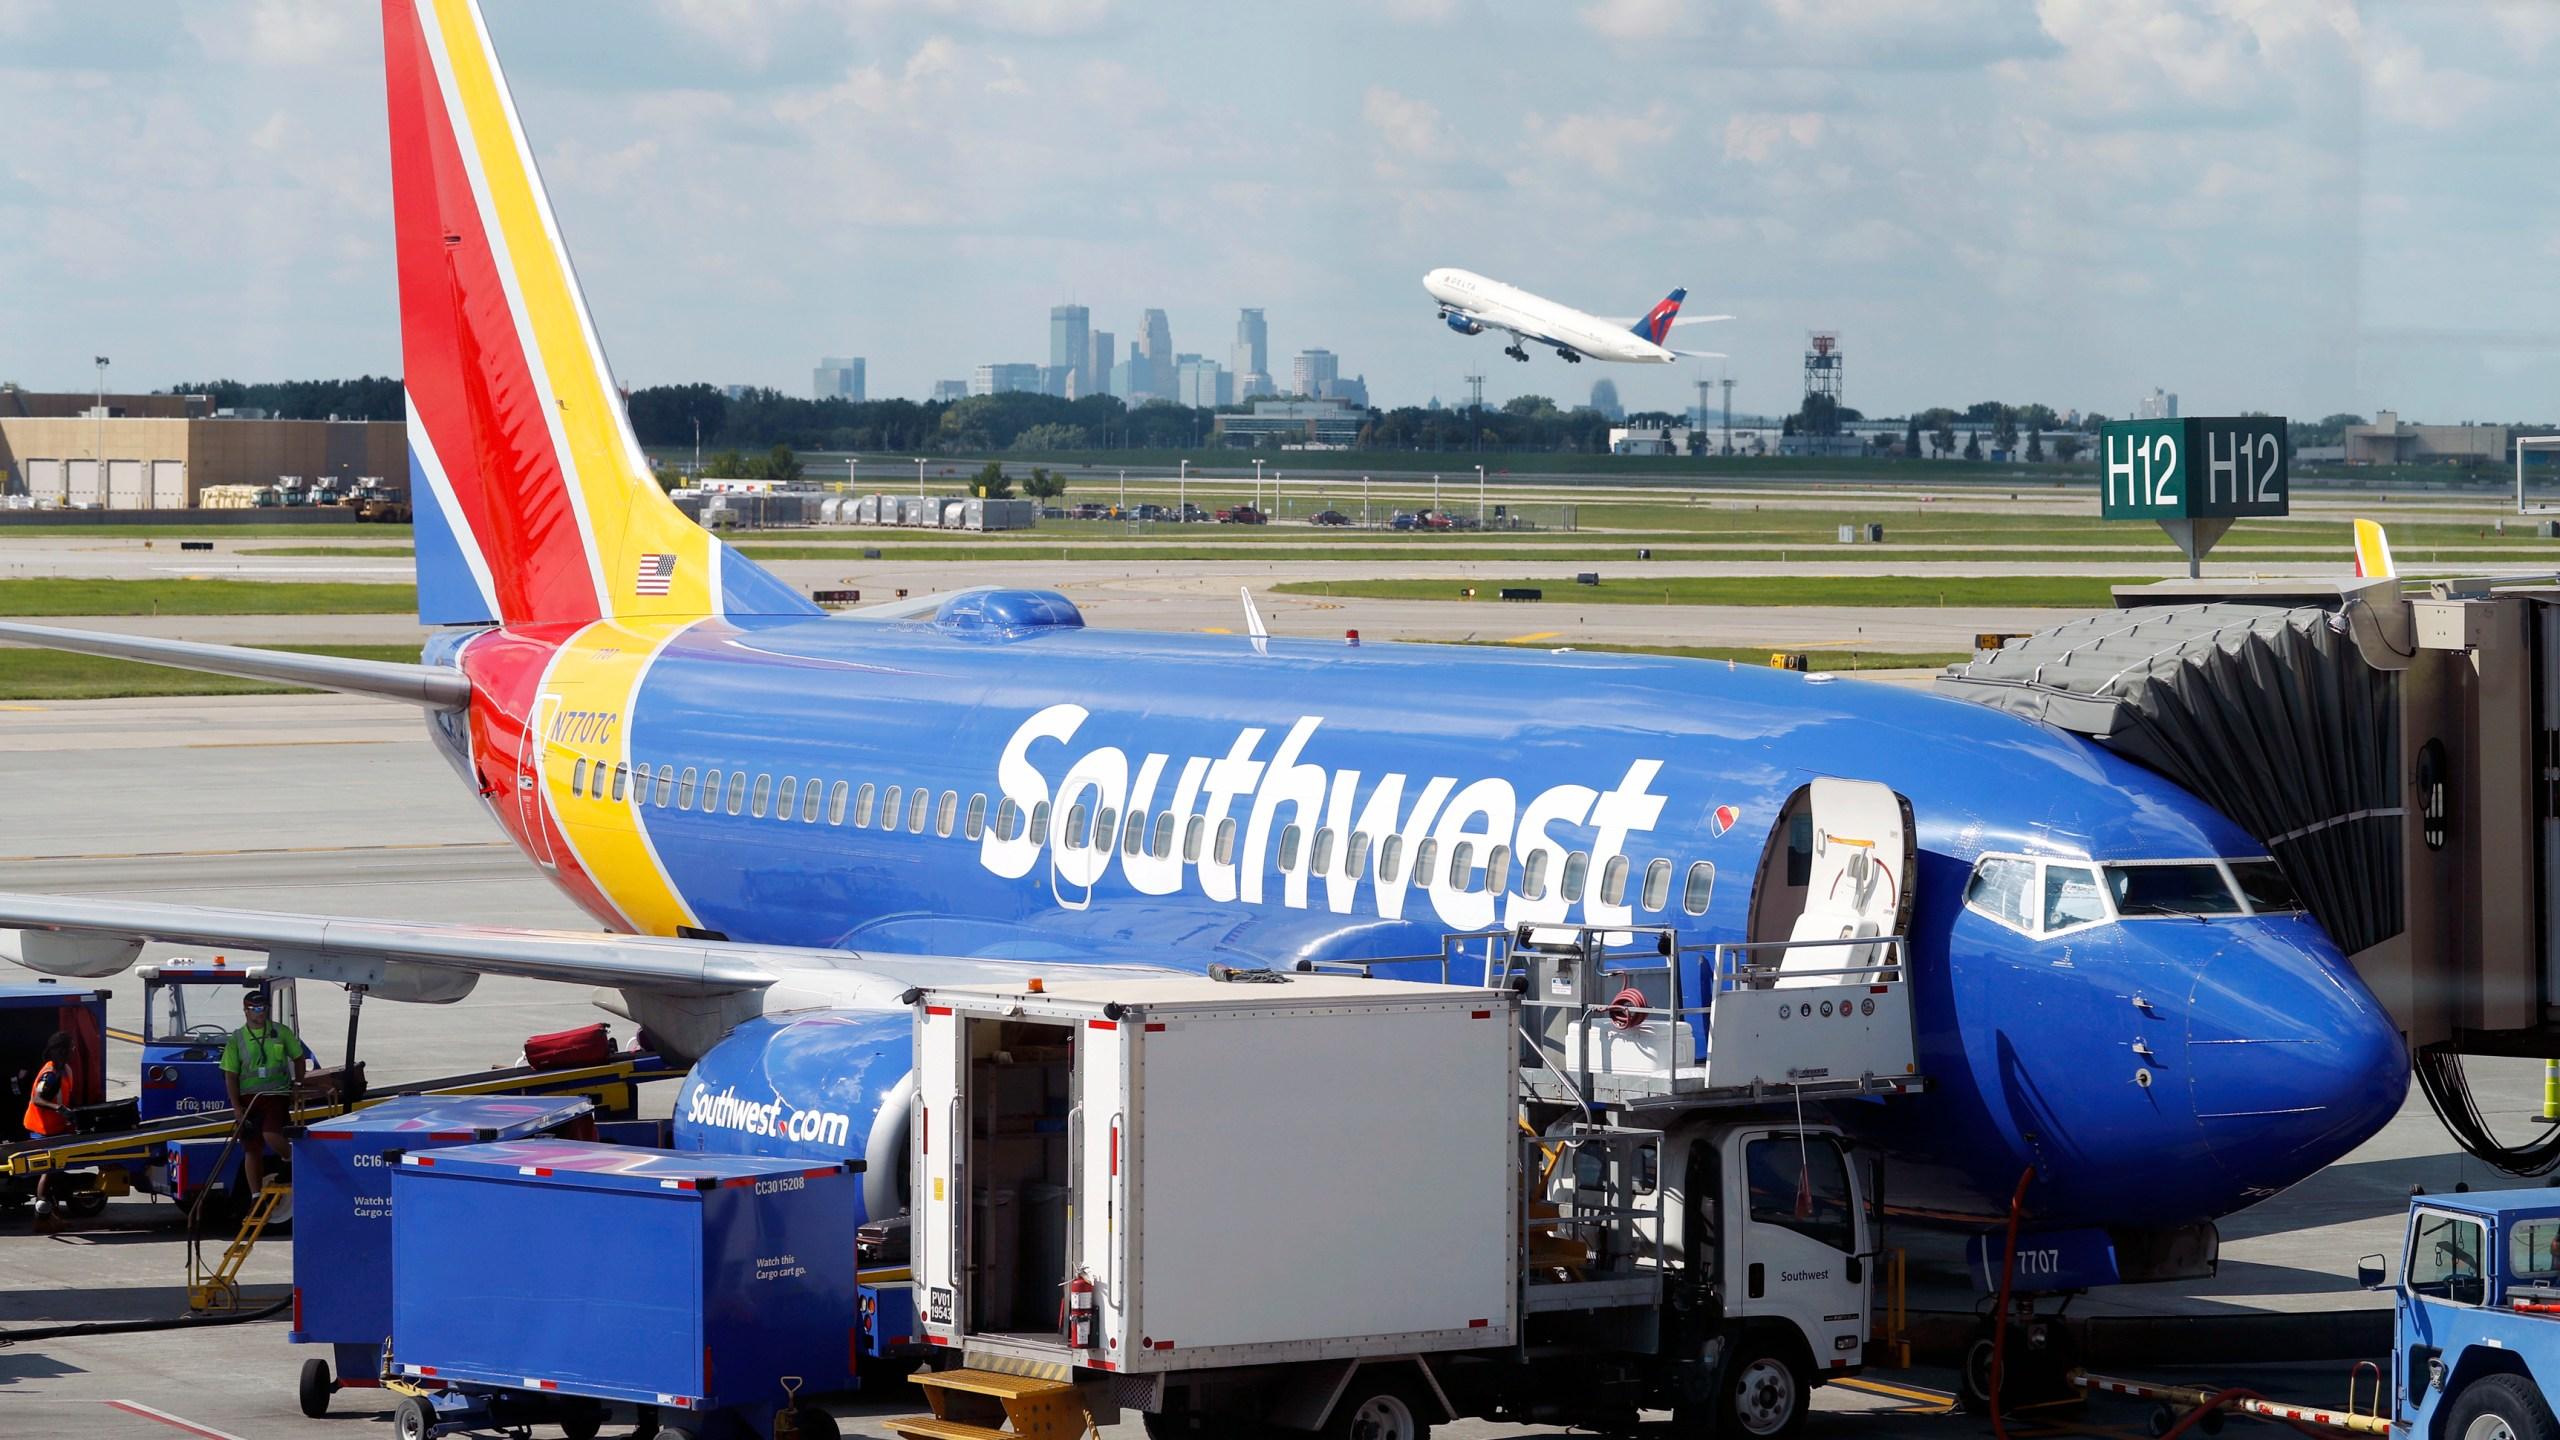 Earns_Southwest_Airlines_49517-159532.jpg03239279